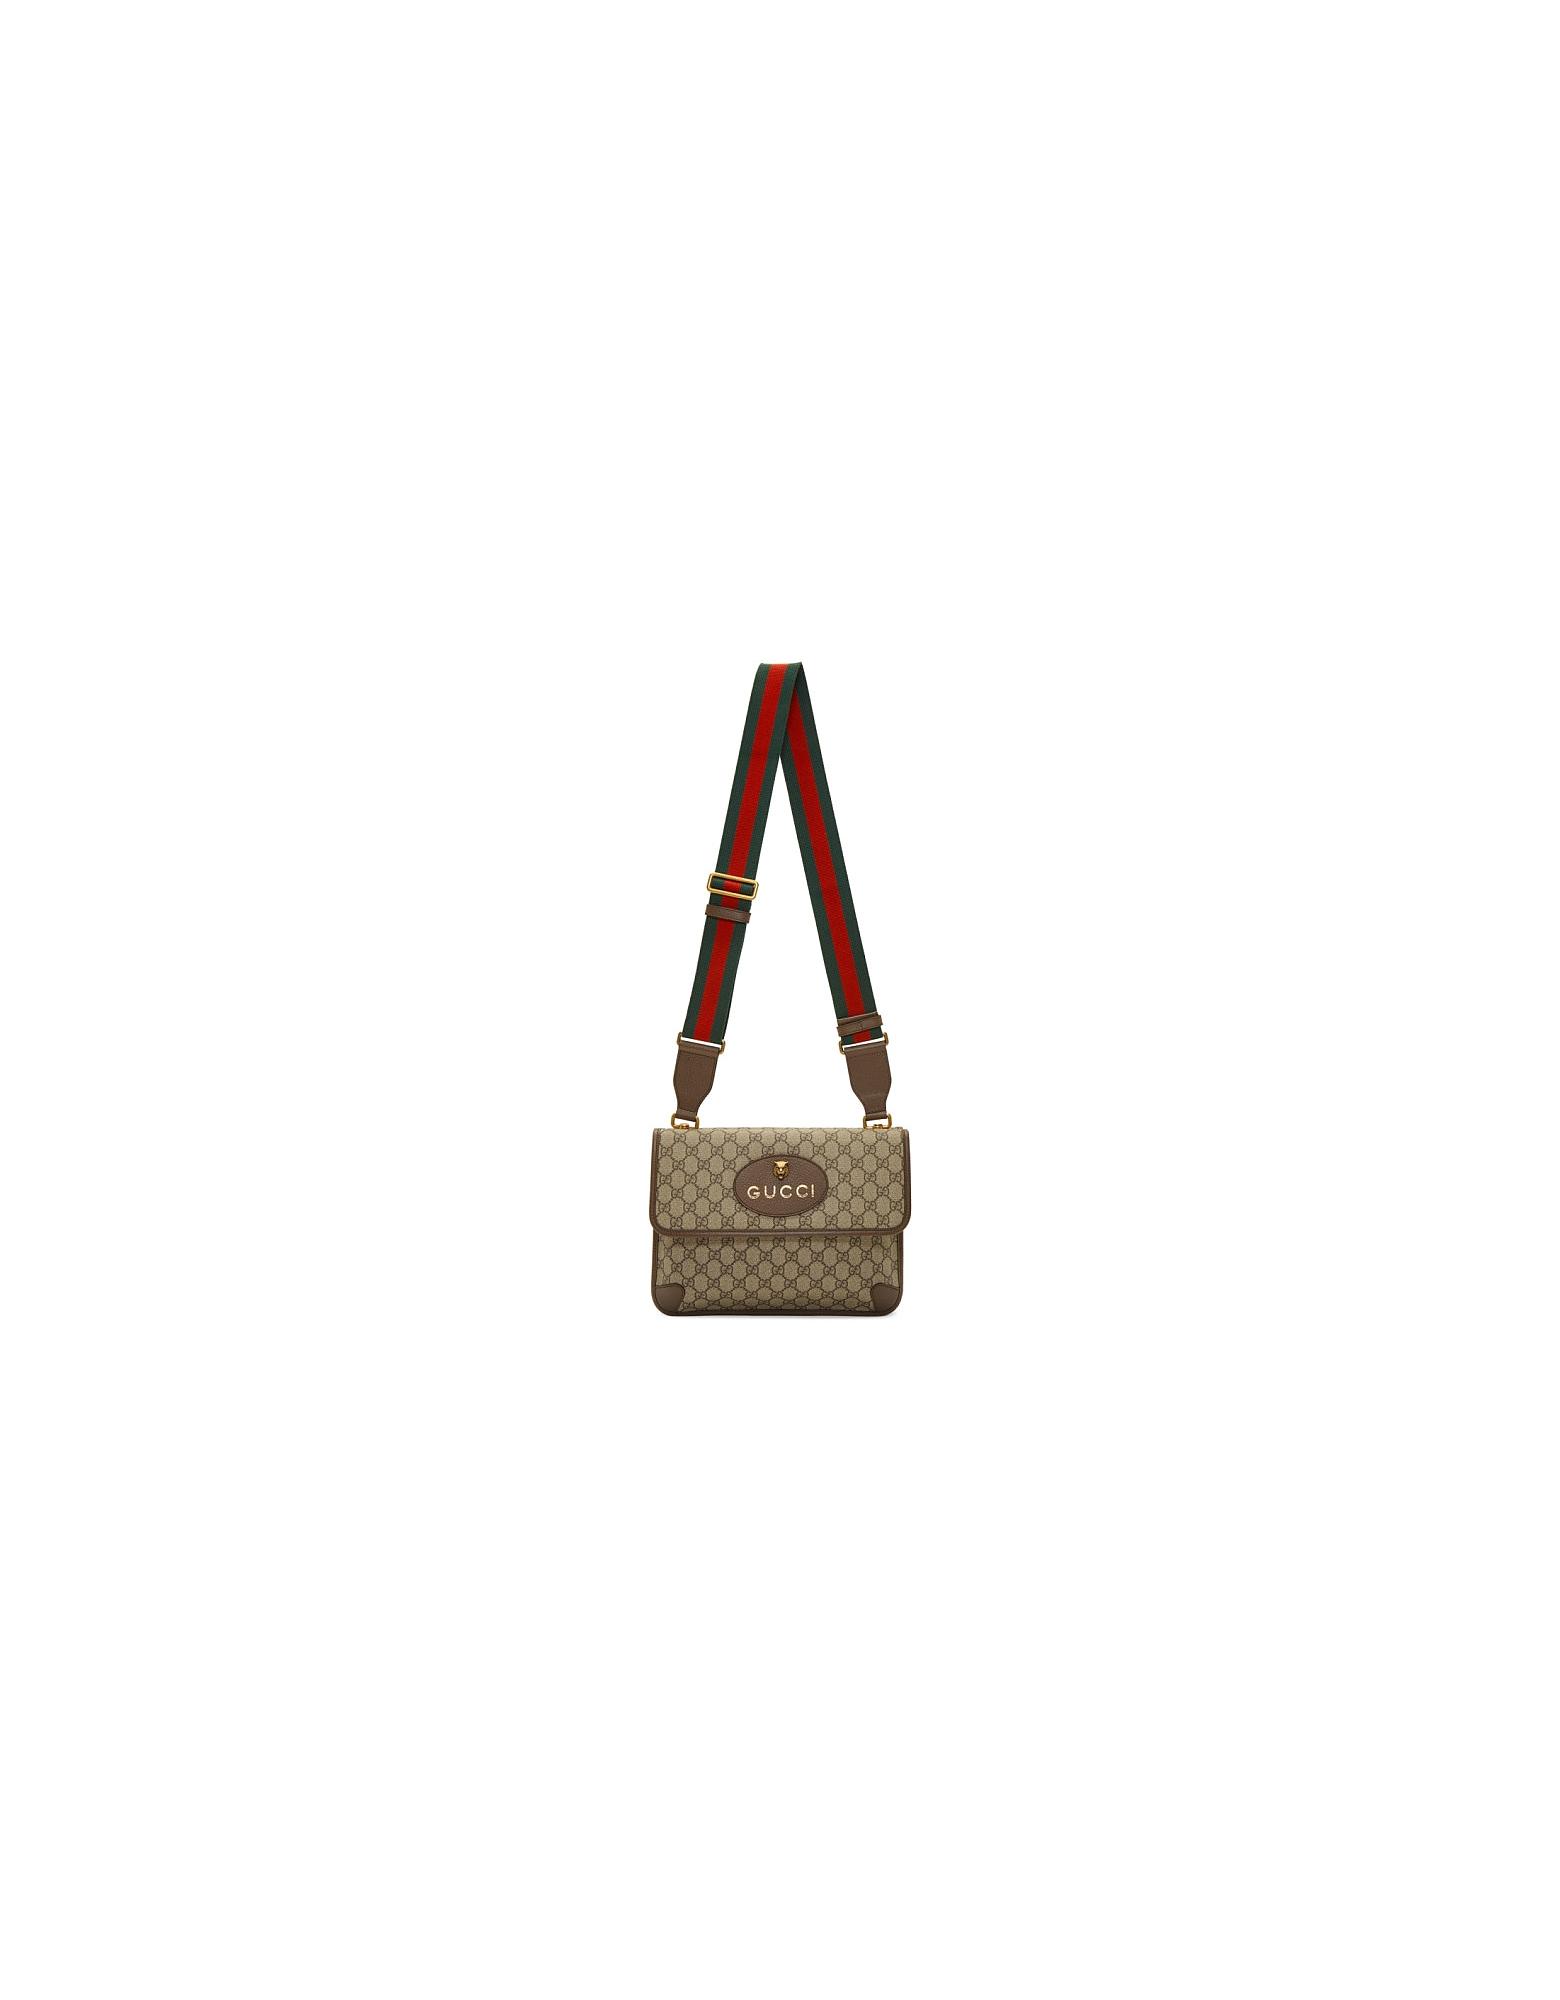 Gucci Designer Handbags, Beige Neo Vintage Foldover Bag